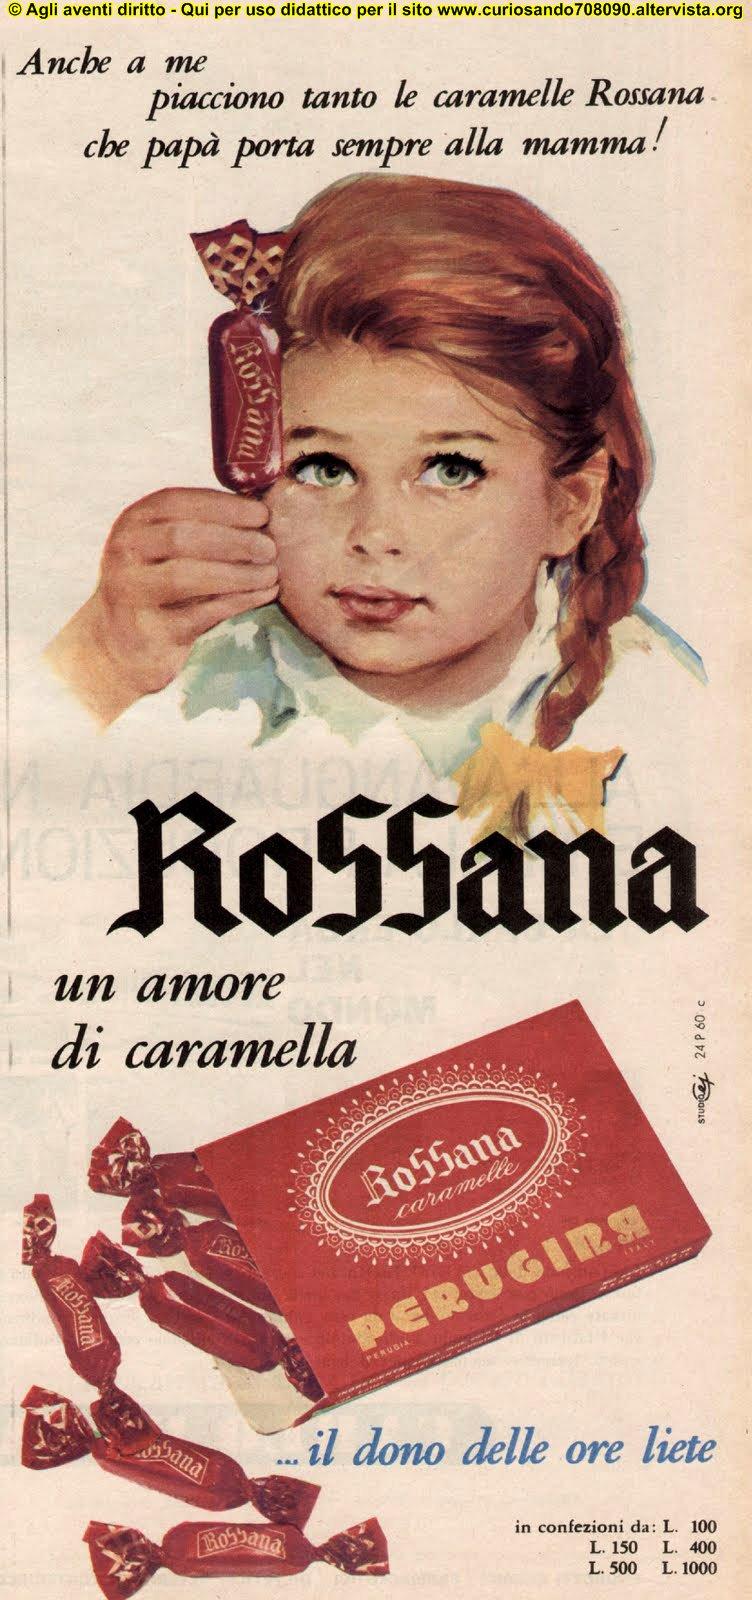 caramelle rossana perugina pubblicità